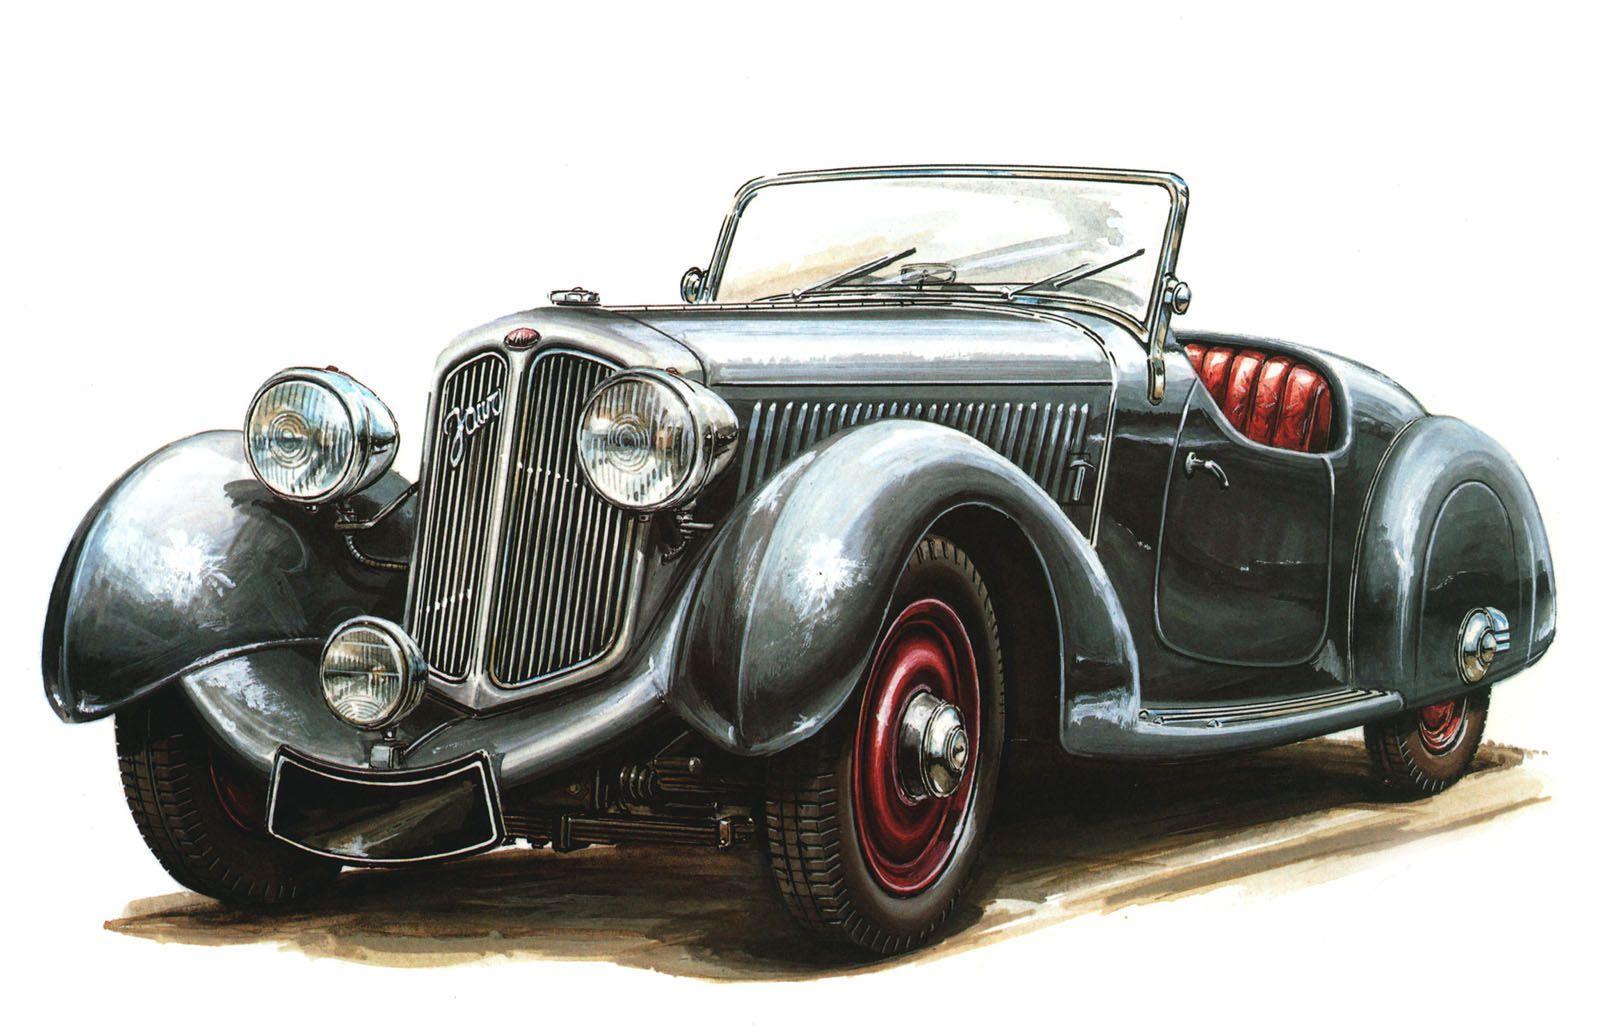 Vintage Car Artwork Vintage Cars Cars Classic Cars